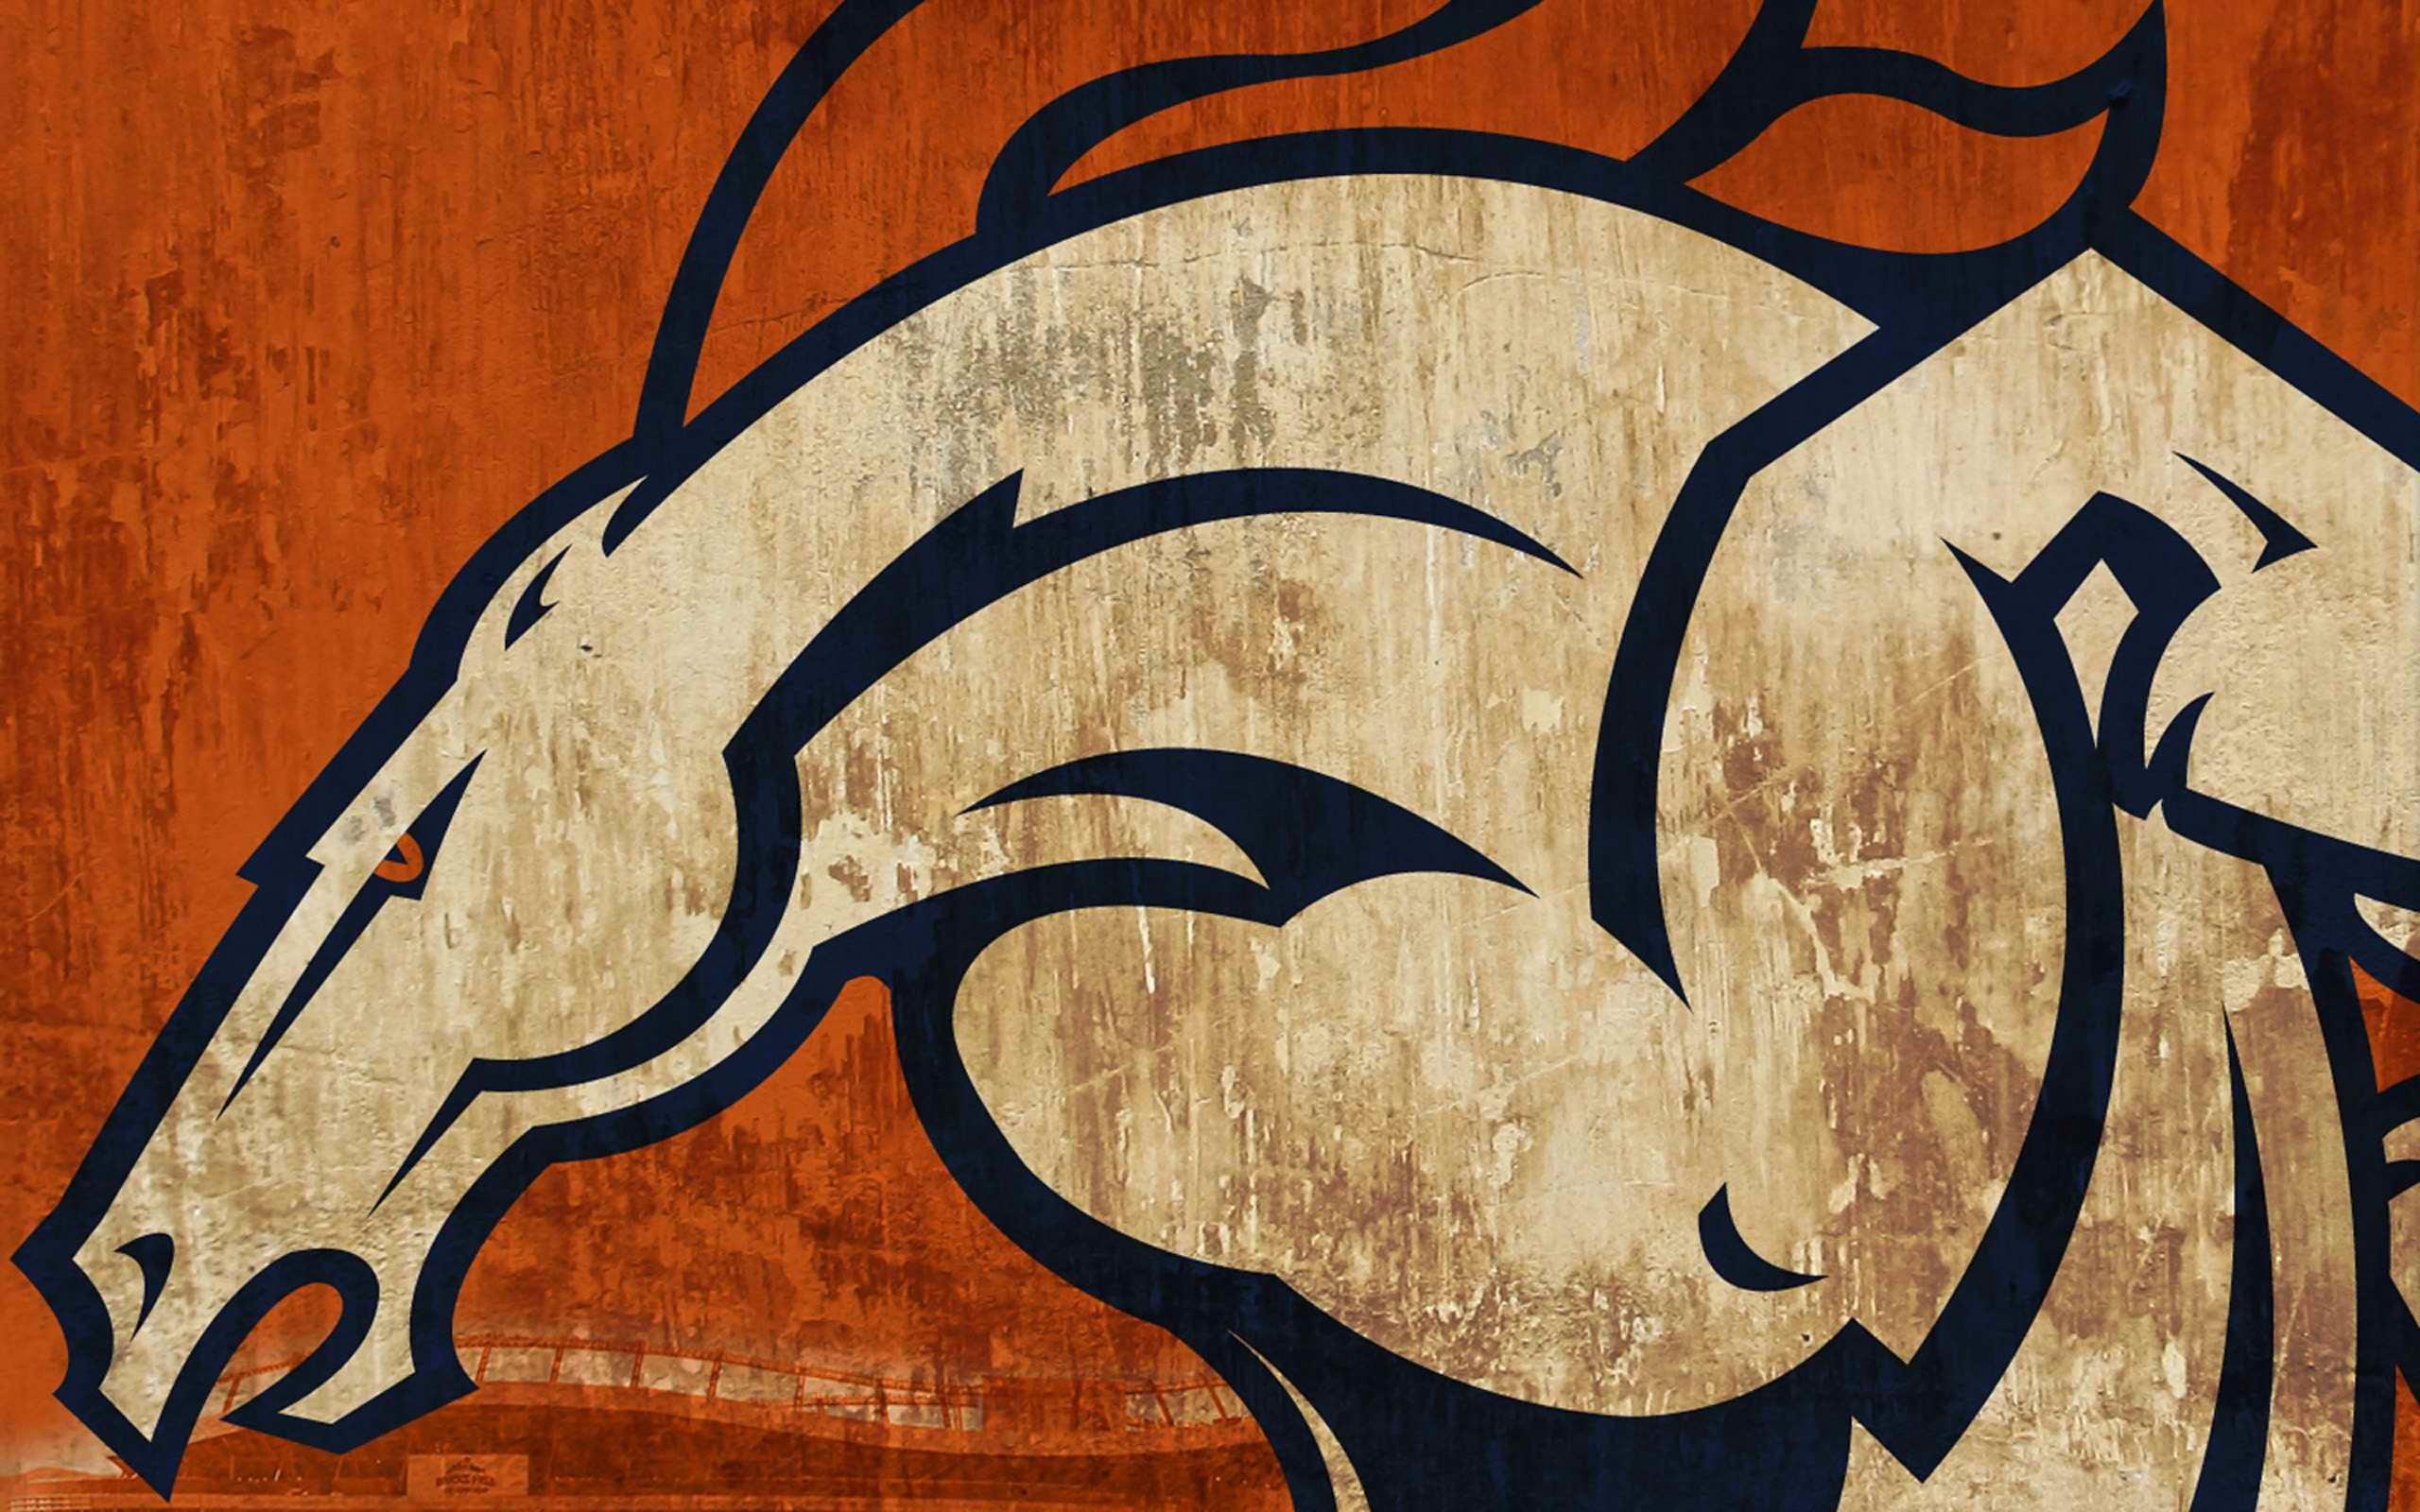 Denver Broncos wallpaper | Denver Broncos wallpapers